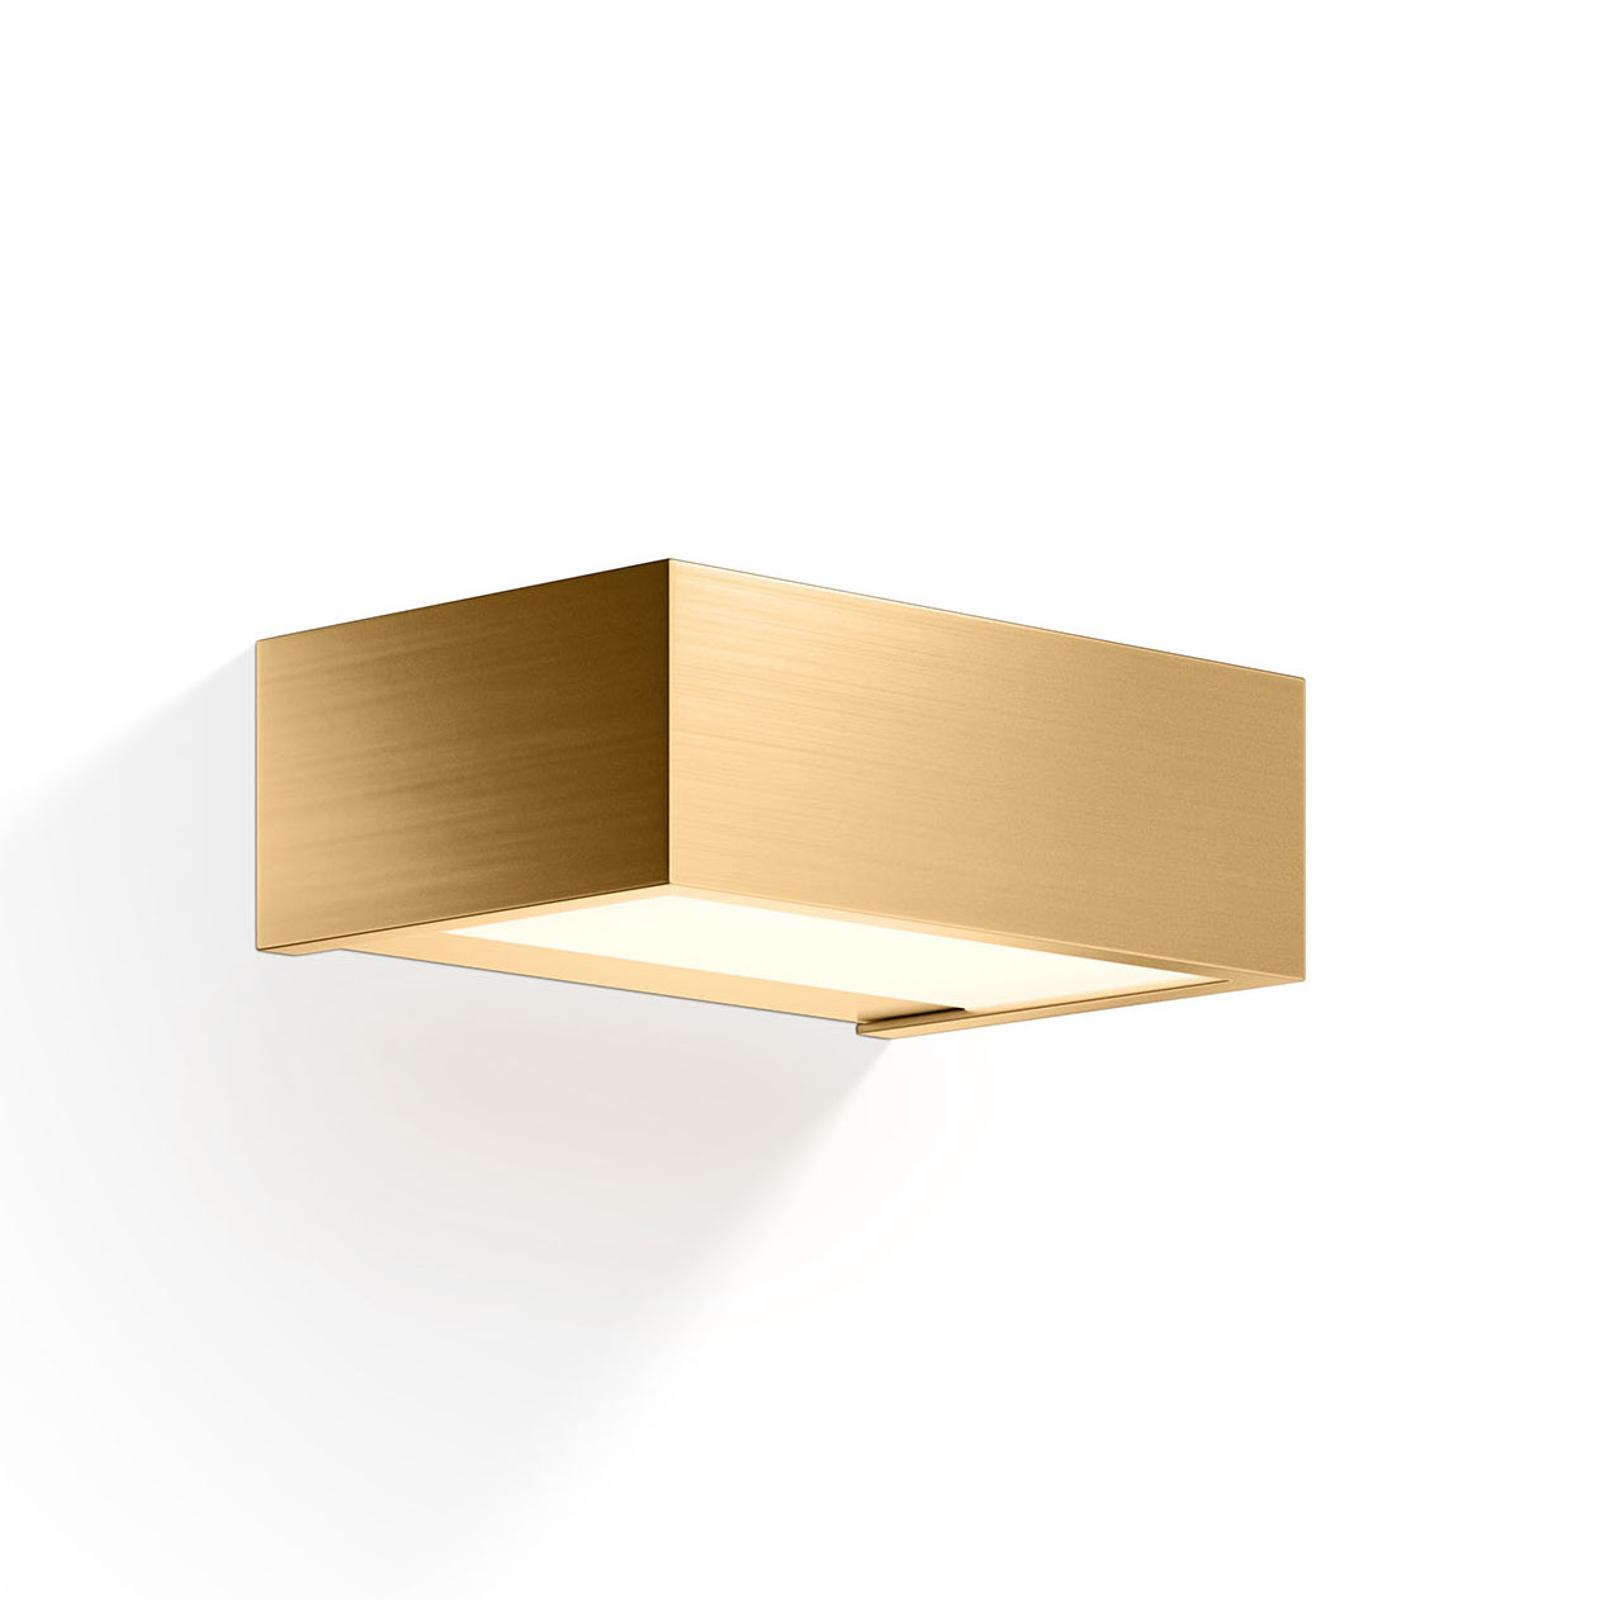 Decor Walther Box LED wandlamp goud 2.700K 15cm